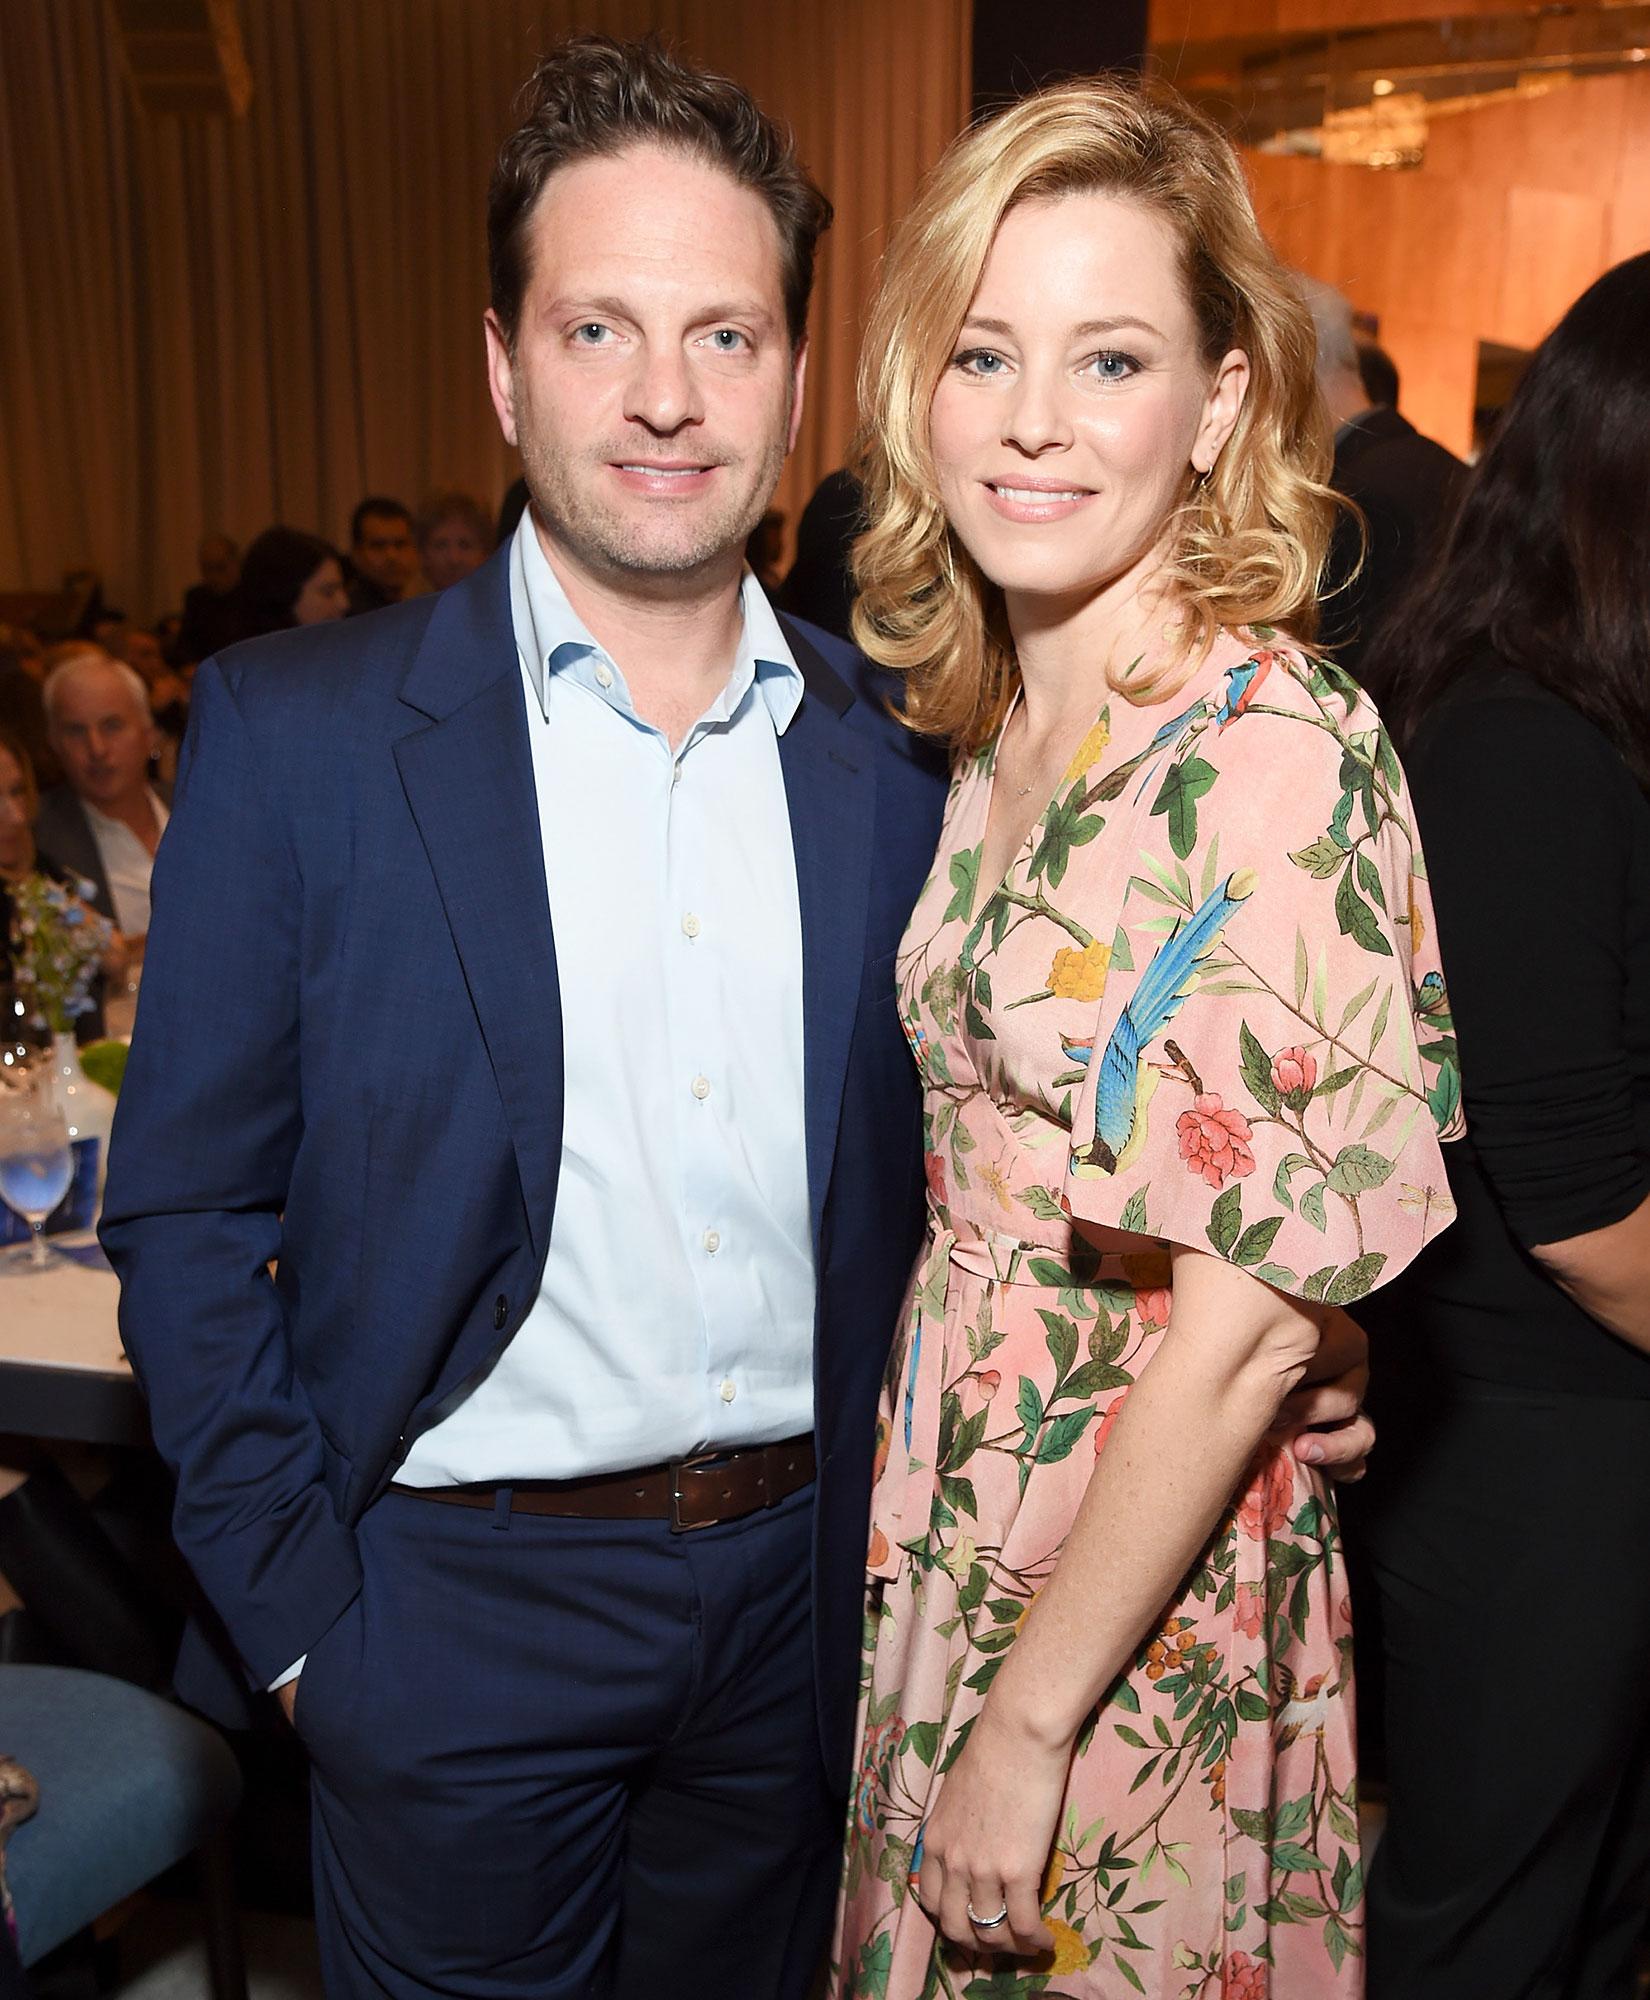 Elizabeth Banks Praises Husband Max Handelman